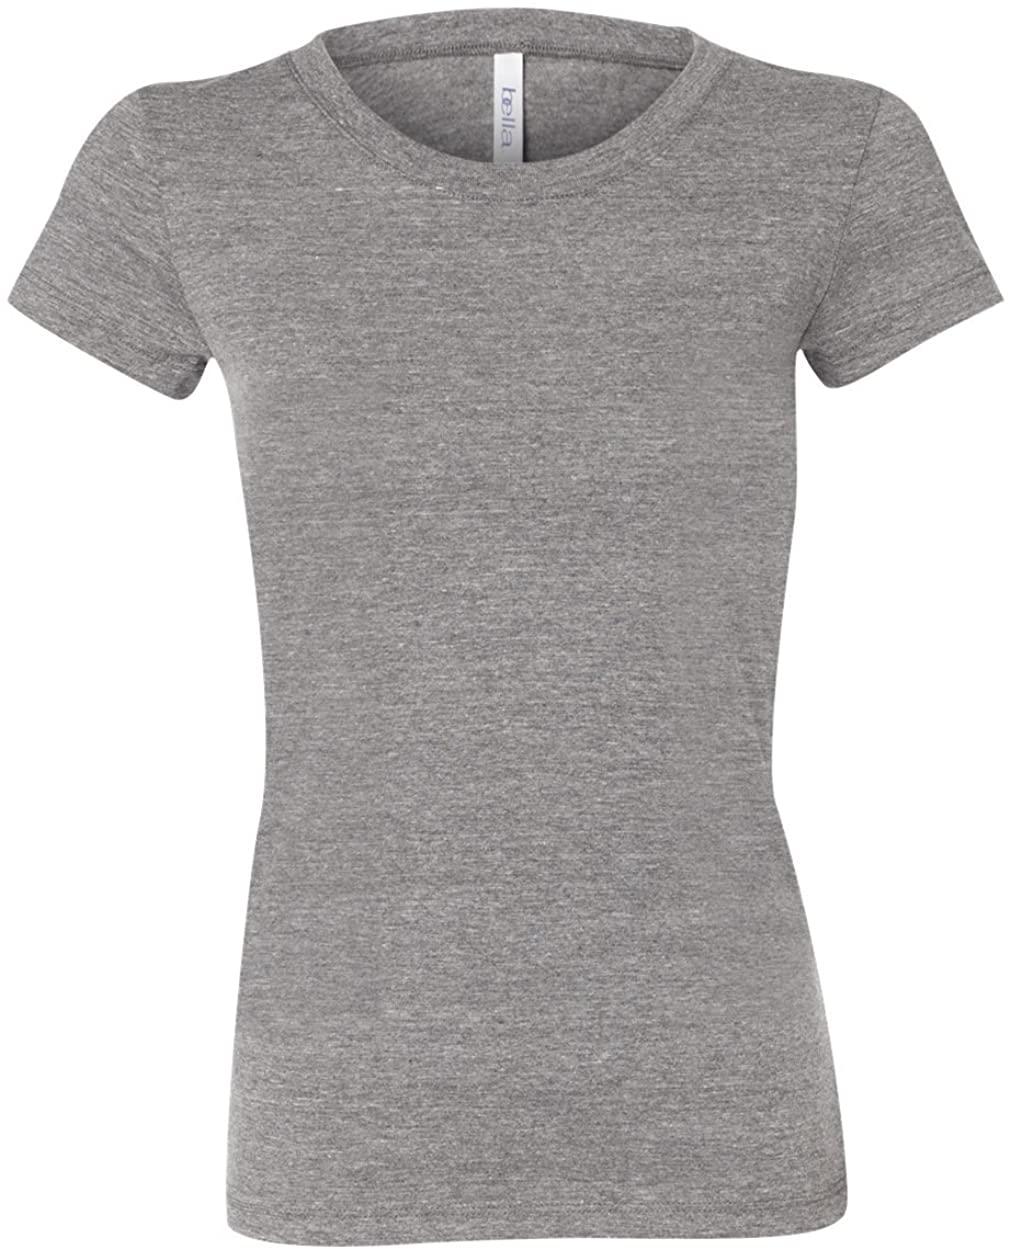 Bella Womens Cameron Tri-Blend Crewneck Short Sleeve T-Shirt - Medium - GREY HEATHER